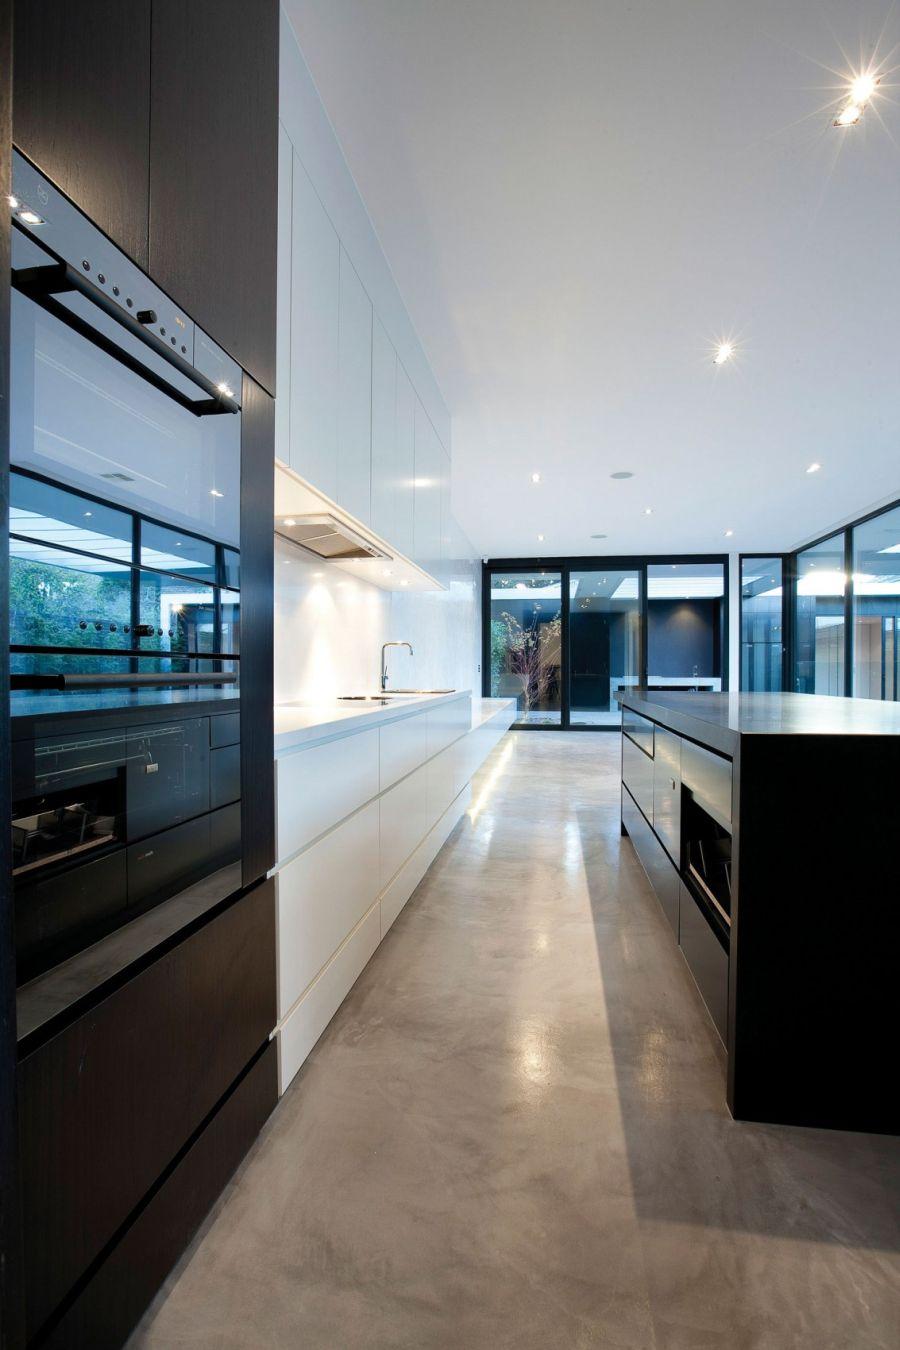 Contemporary kitchen island in black